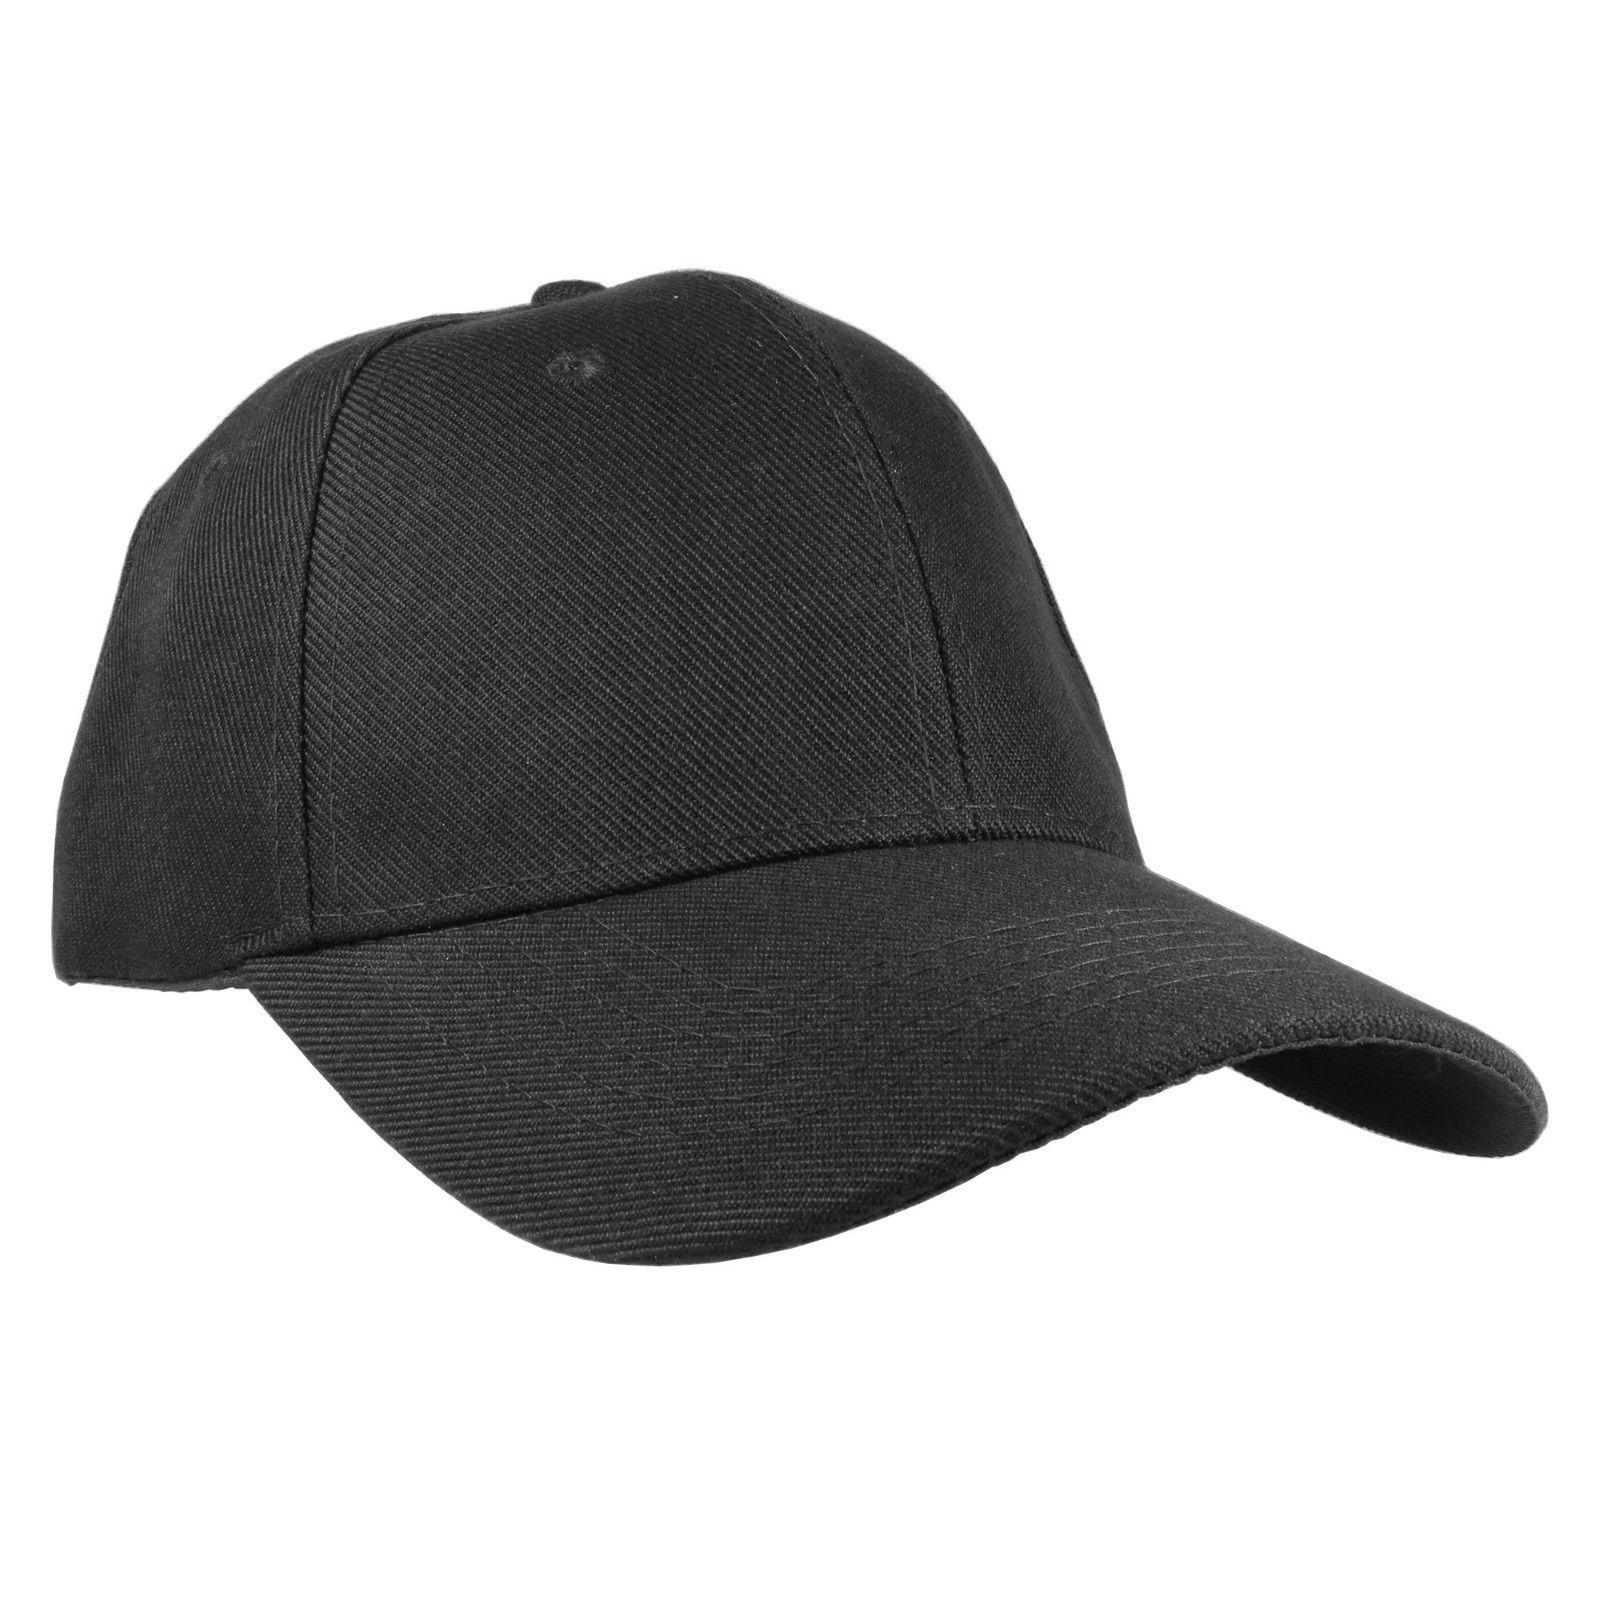 Plain Solid Baseball Cap Hats wholesale lot 12pcs